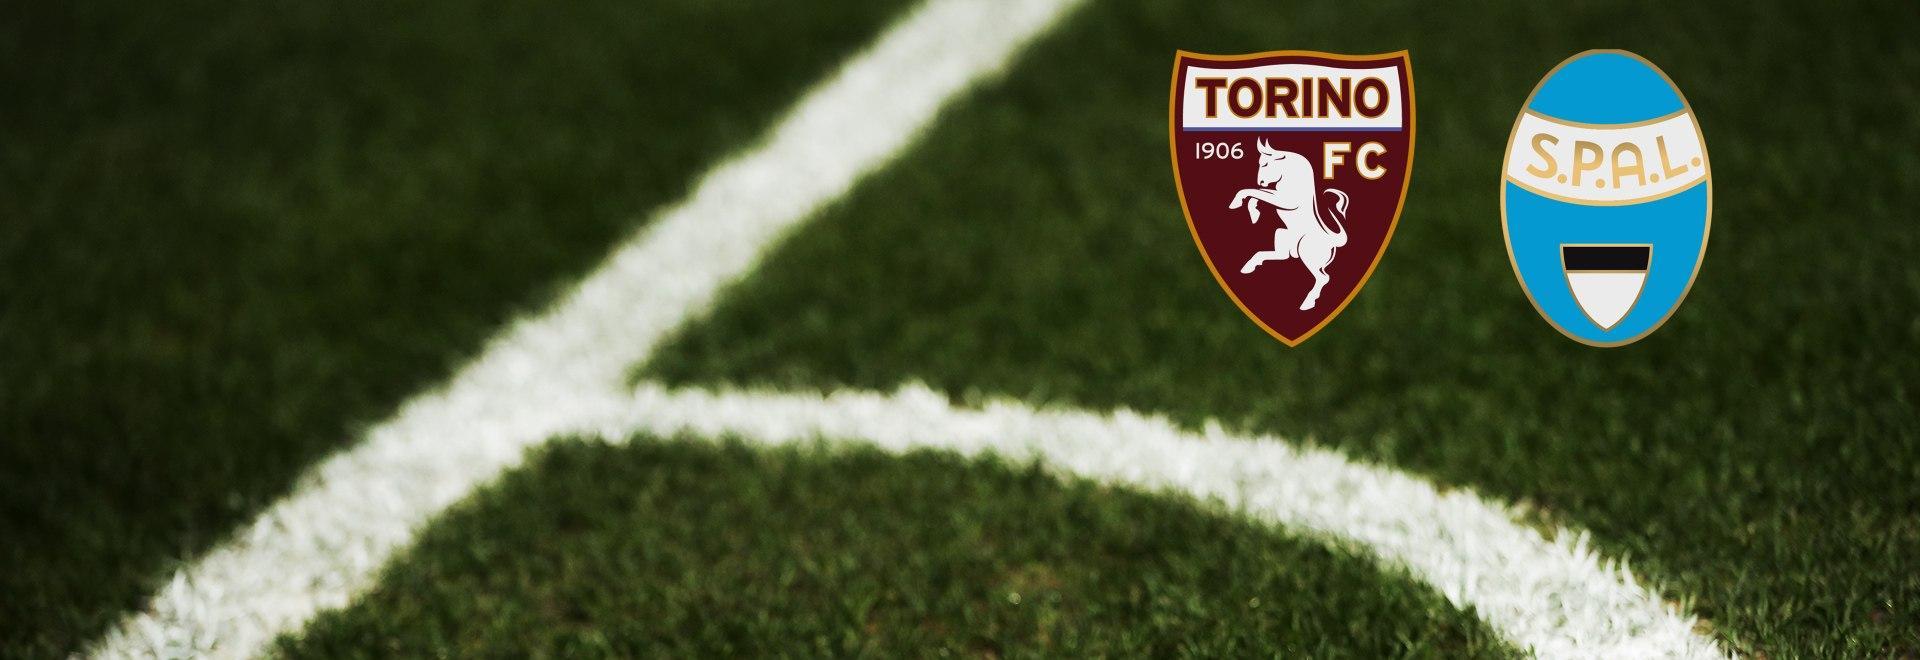 Torino - Spal. 17a g.